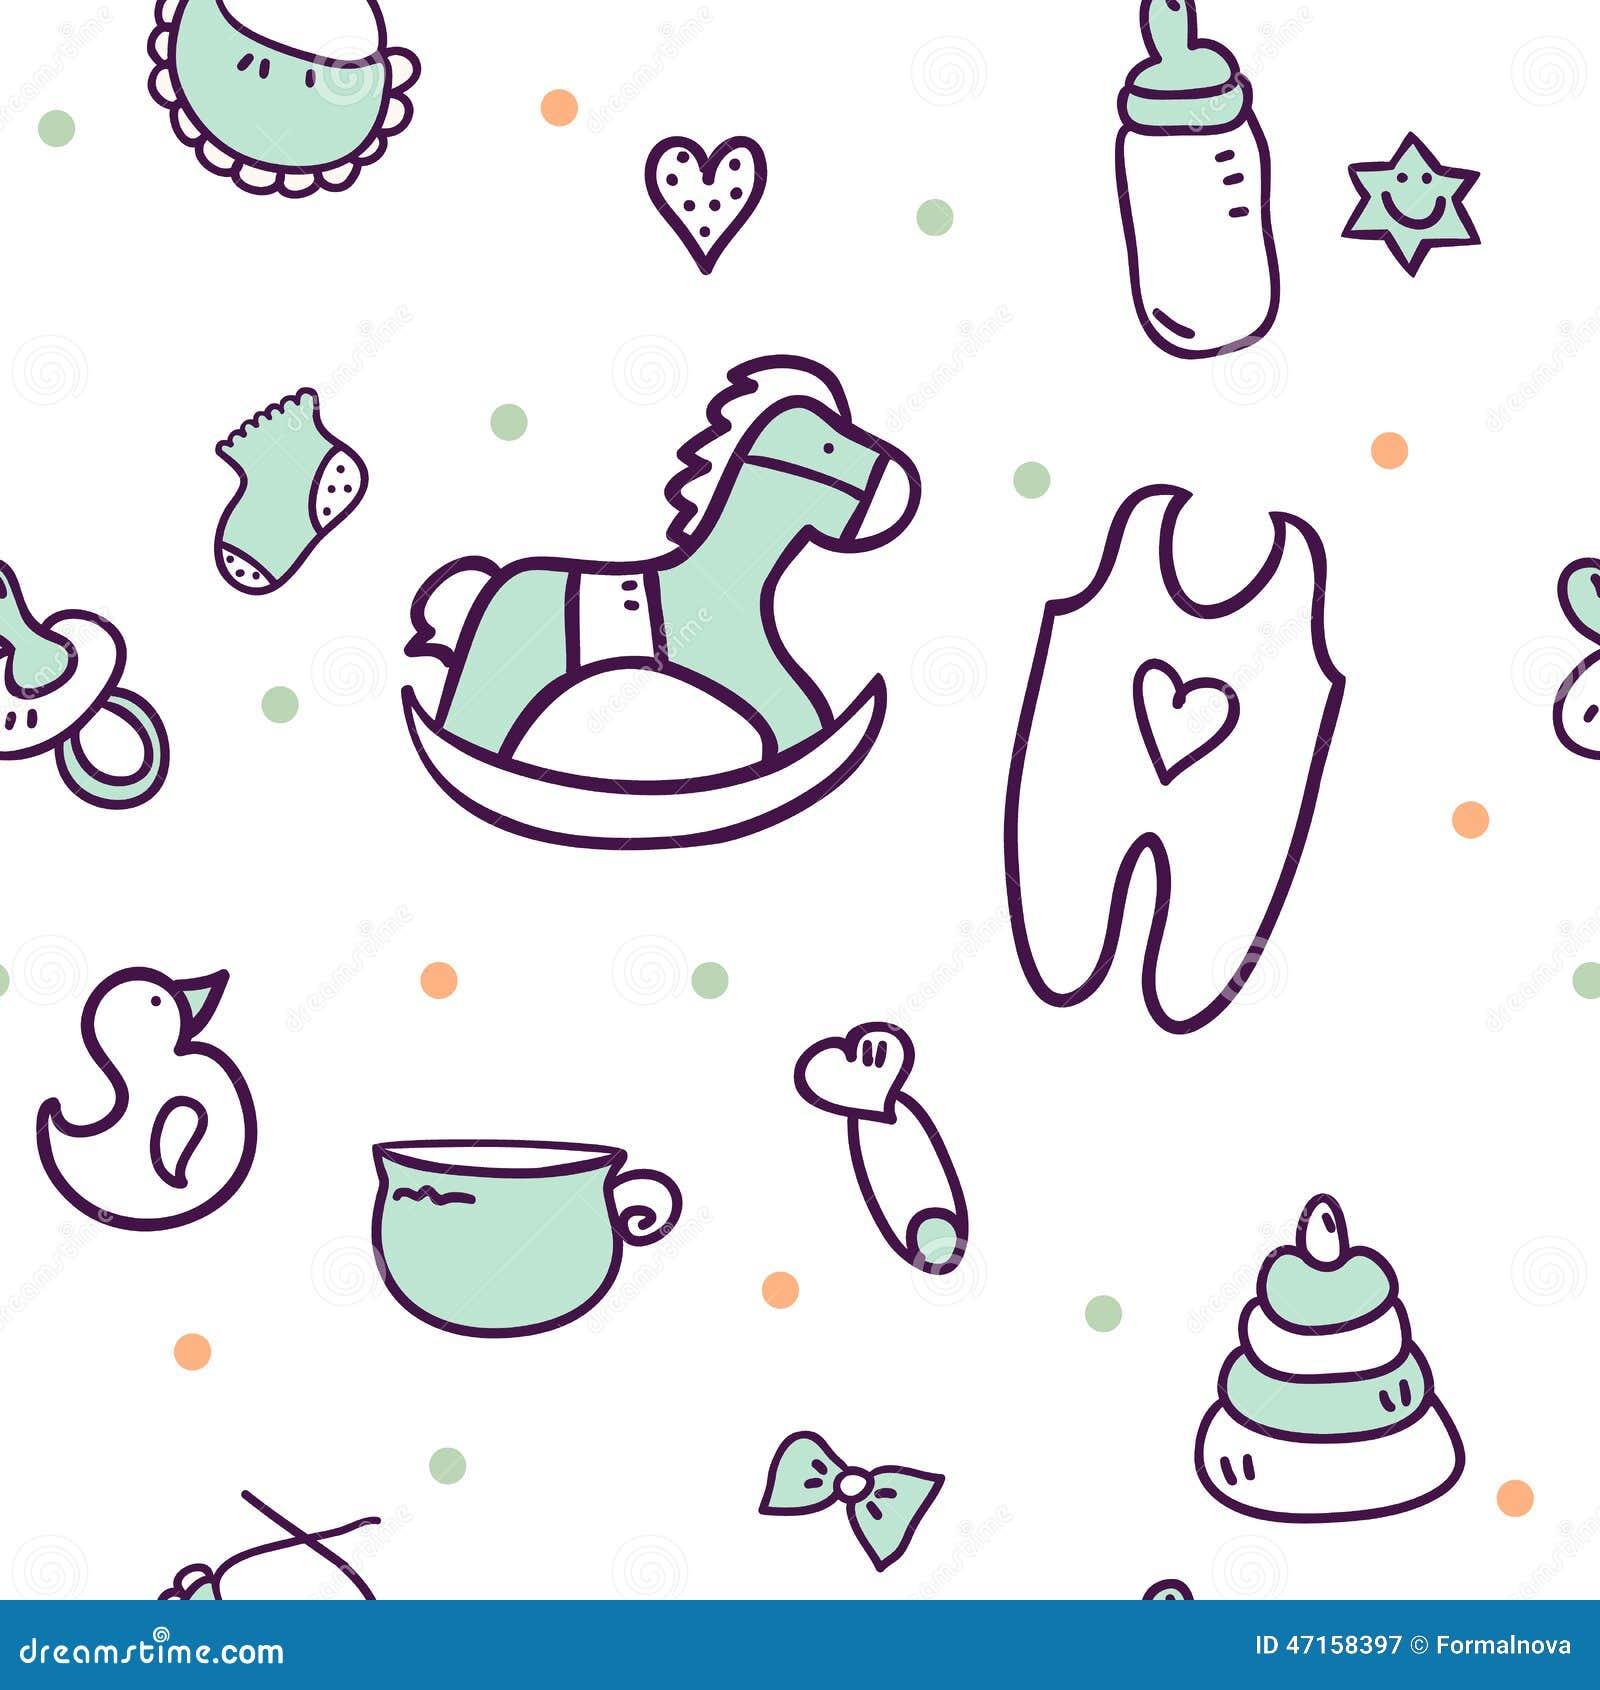 Hand Drawn Baby Shower Design Elements Illustration 47158397 Megapixl